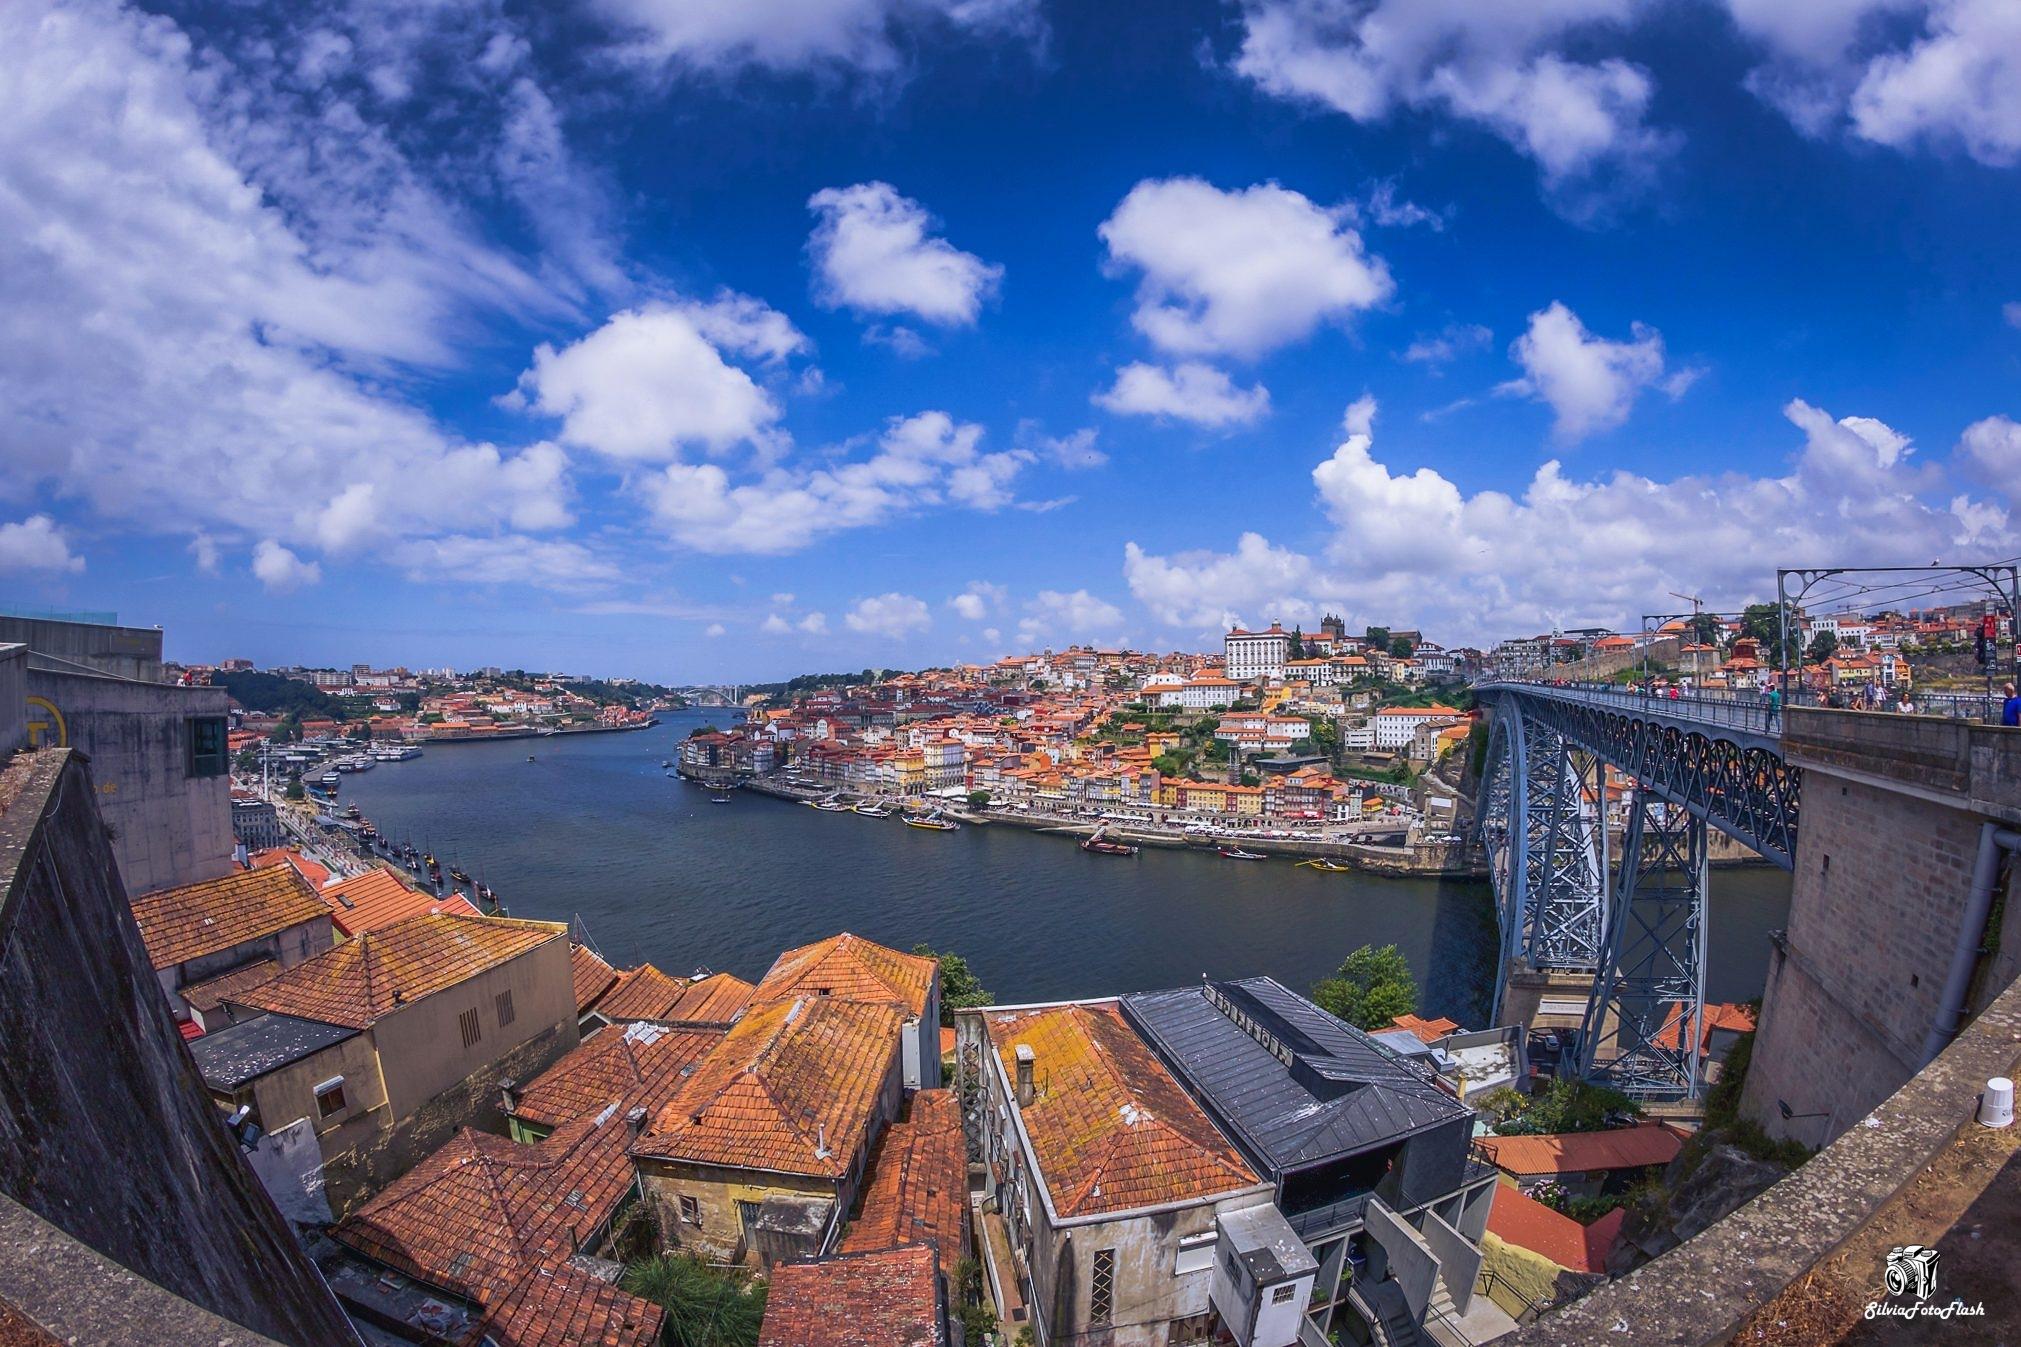 City of Porto by Silvia couto